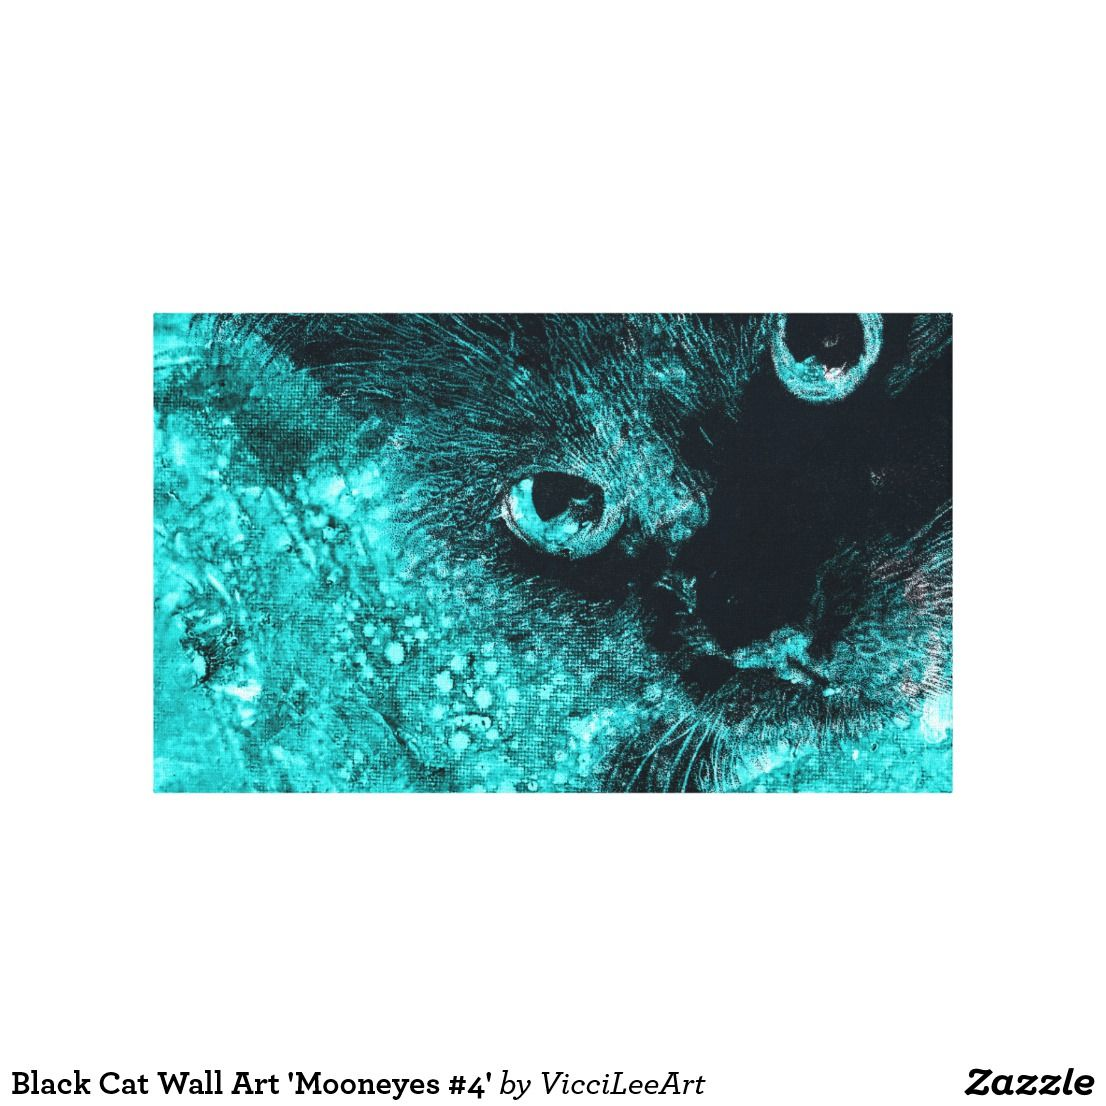 Black cat wall art umooneyes u artwork